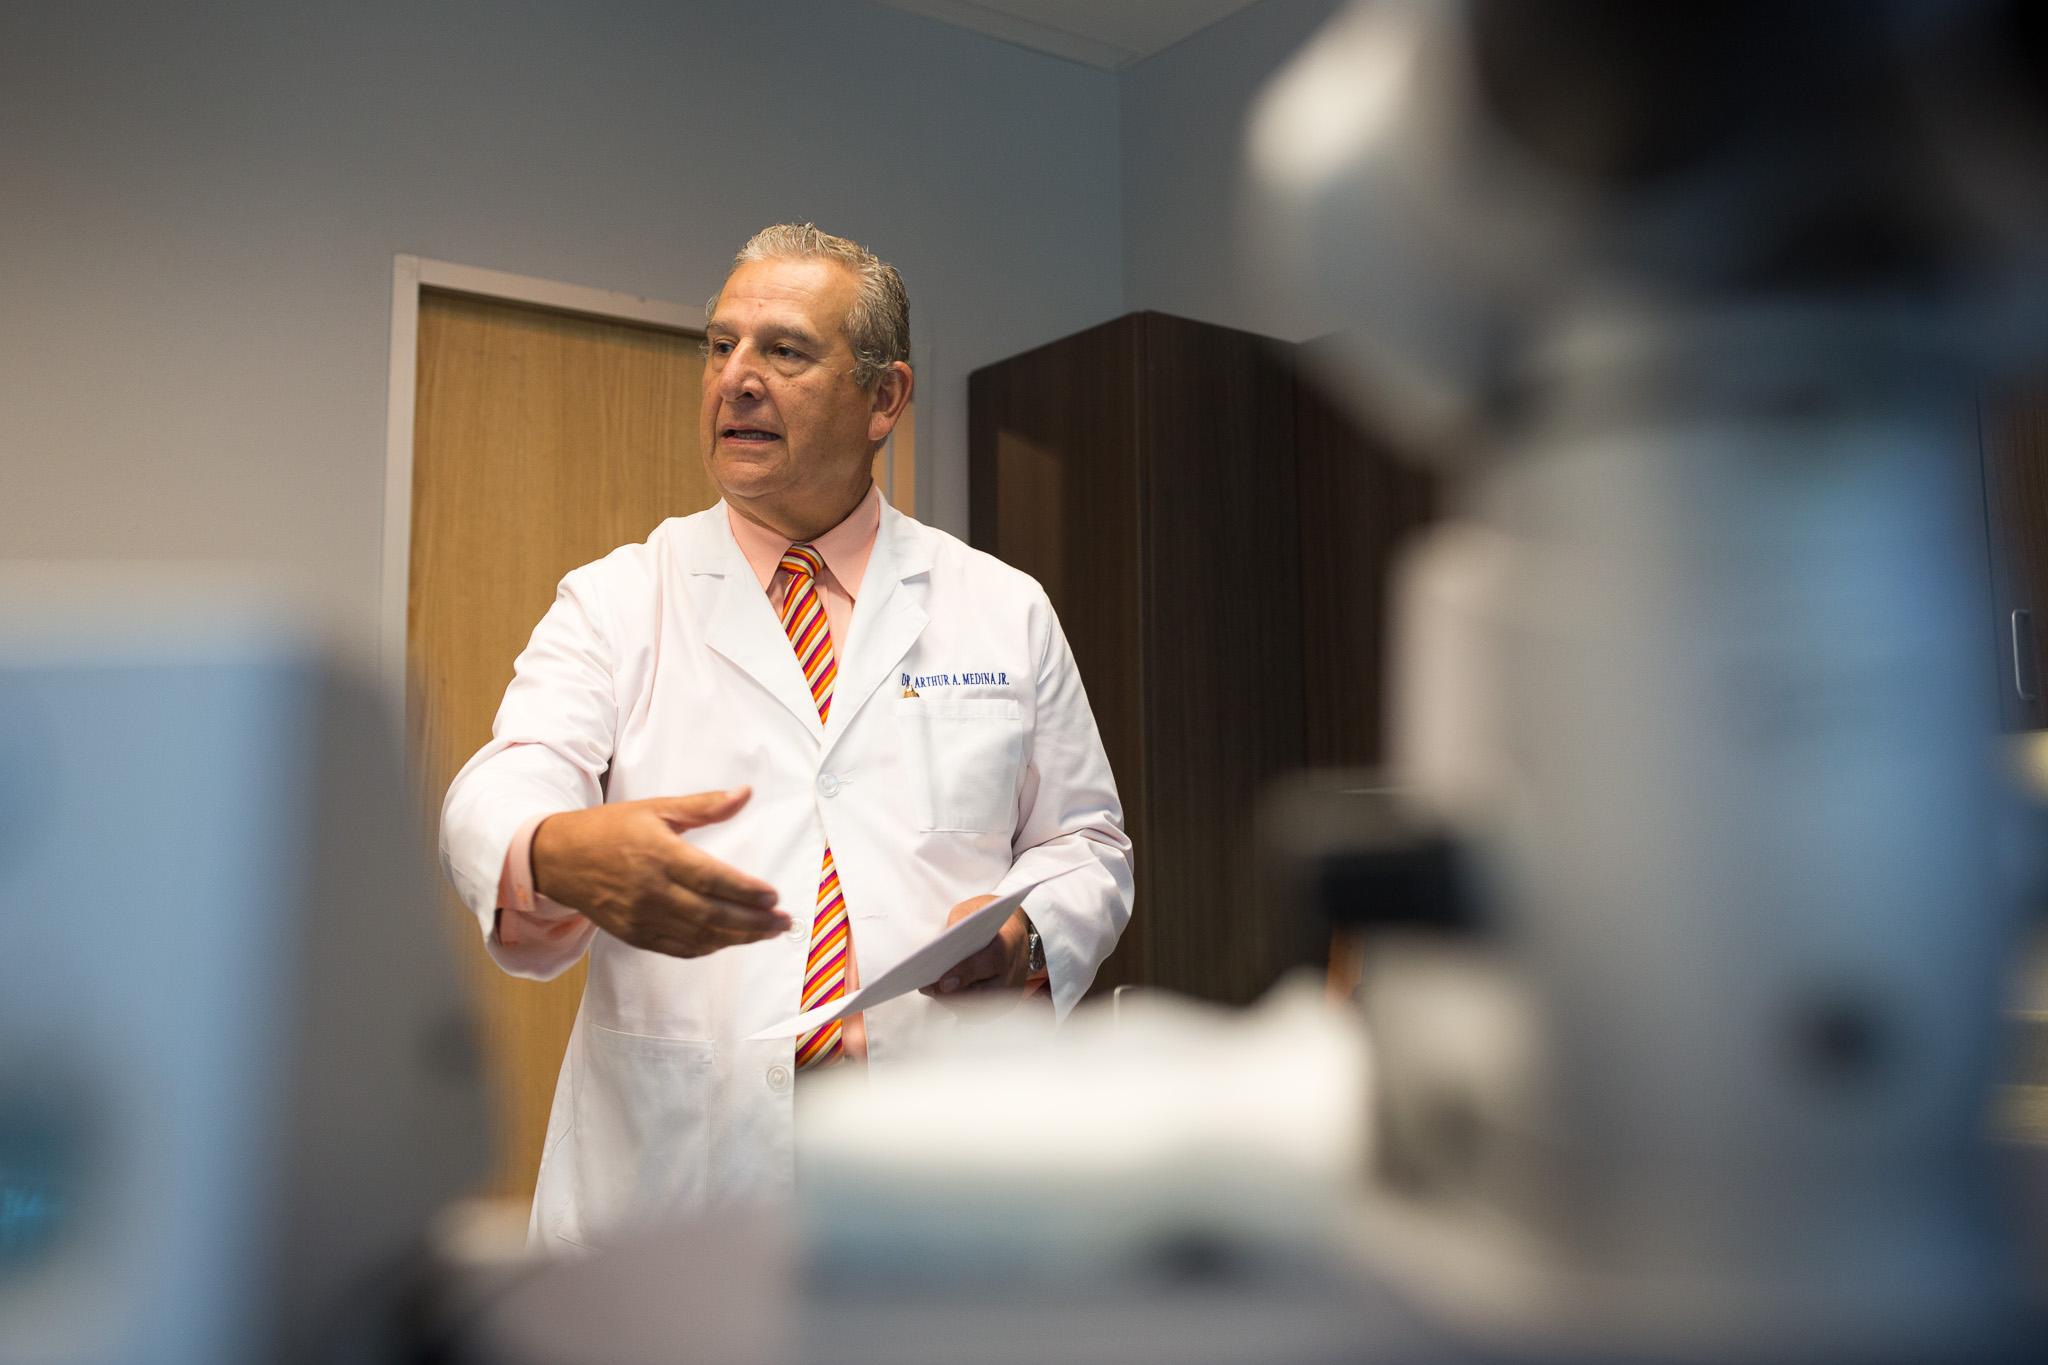 Dr. Art Medina explains the technology behind the new innovative procedure.